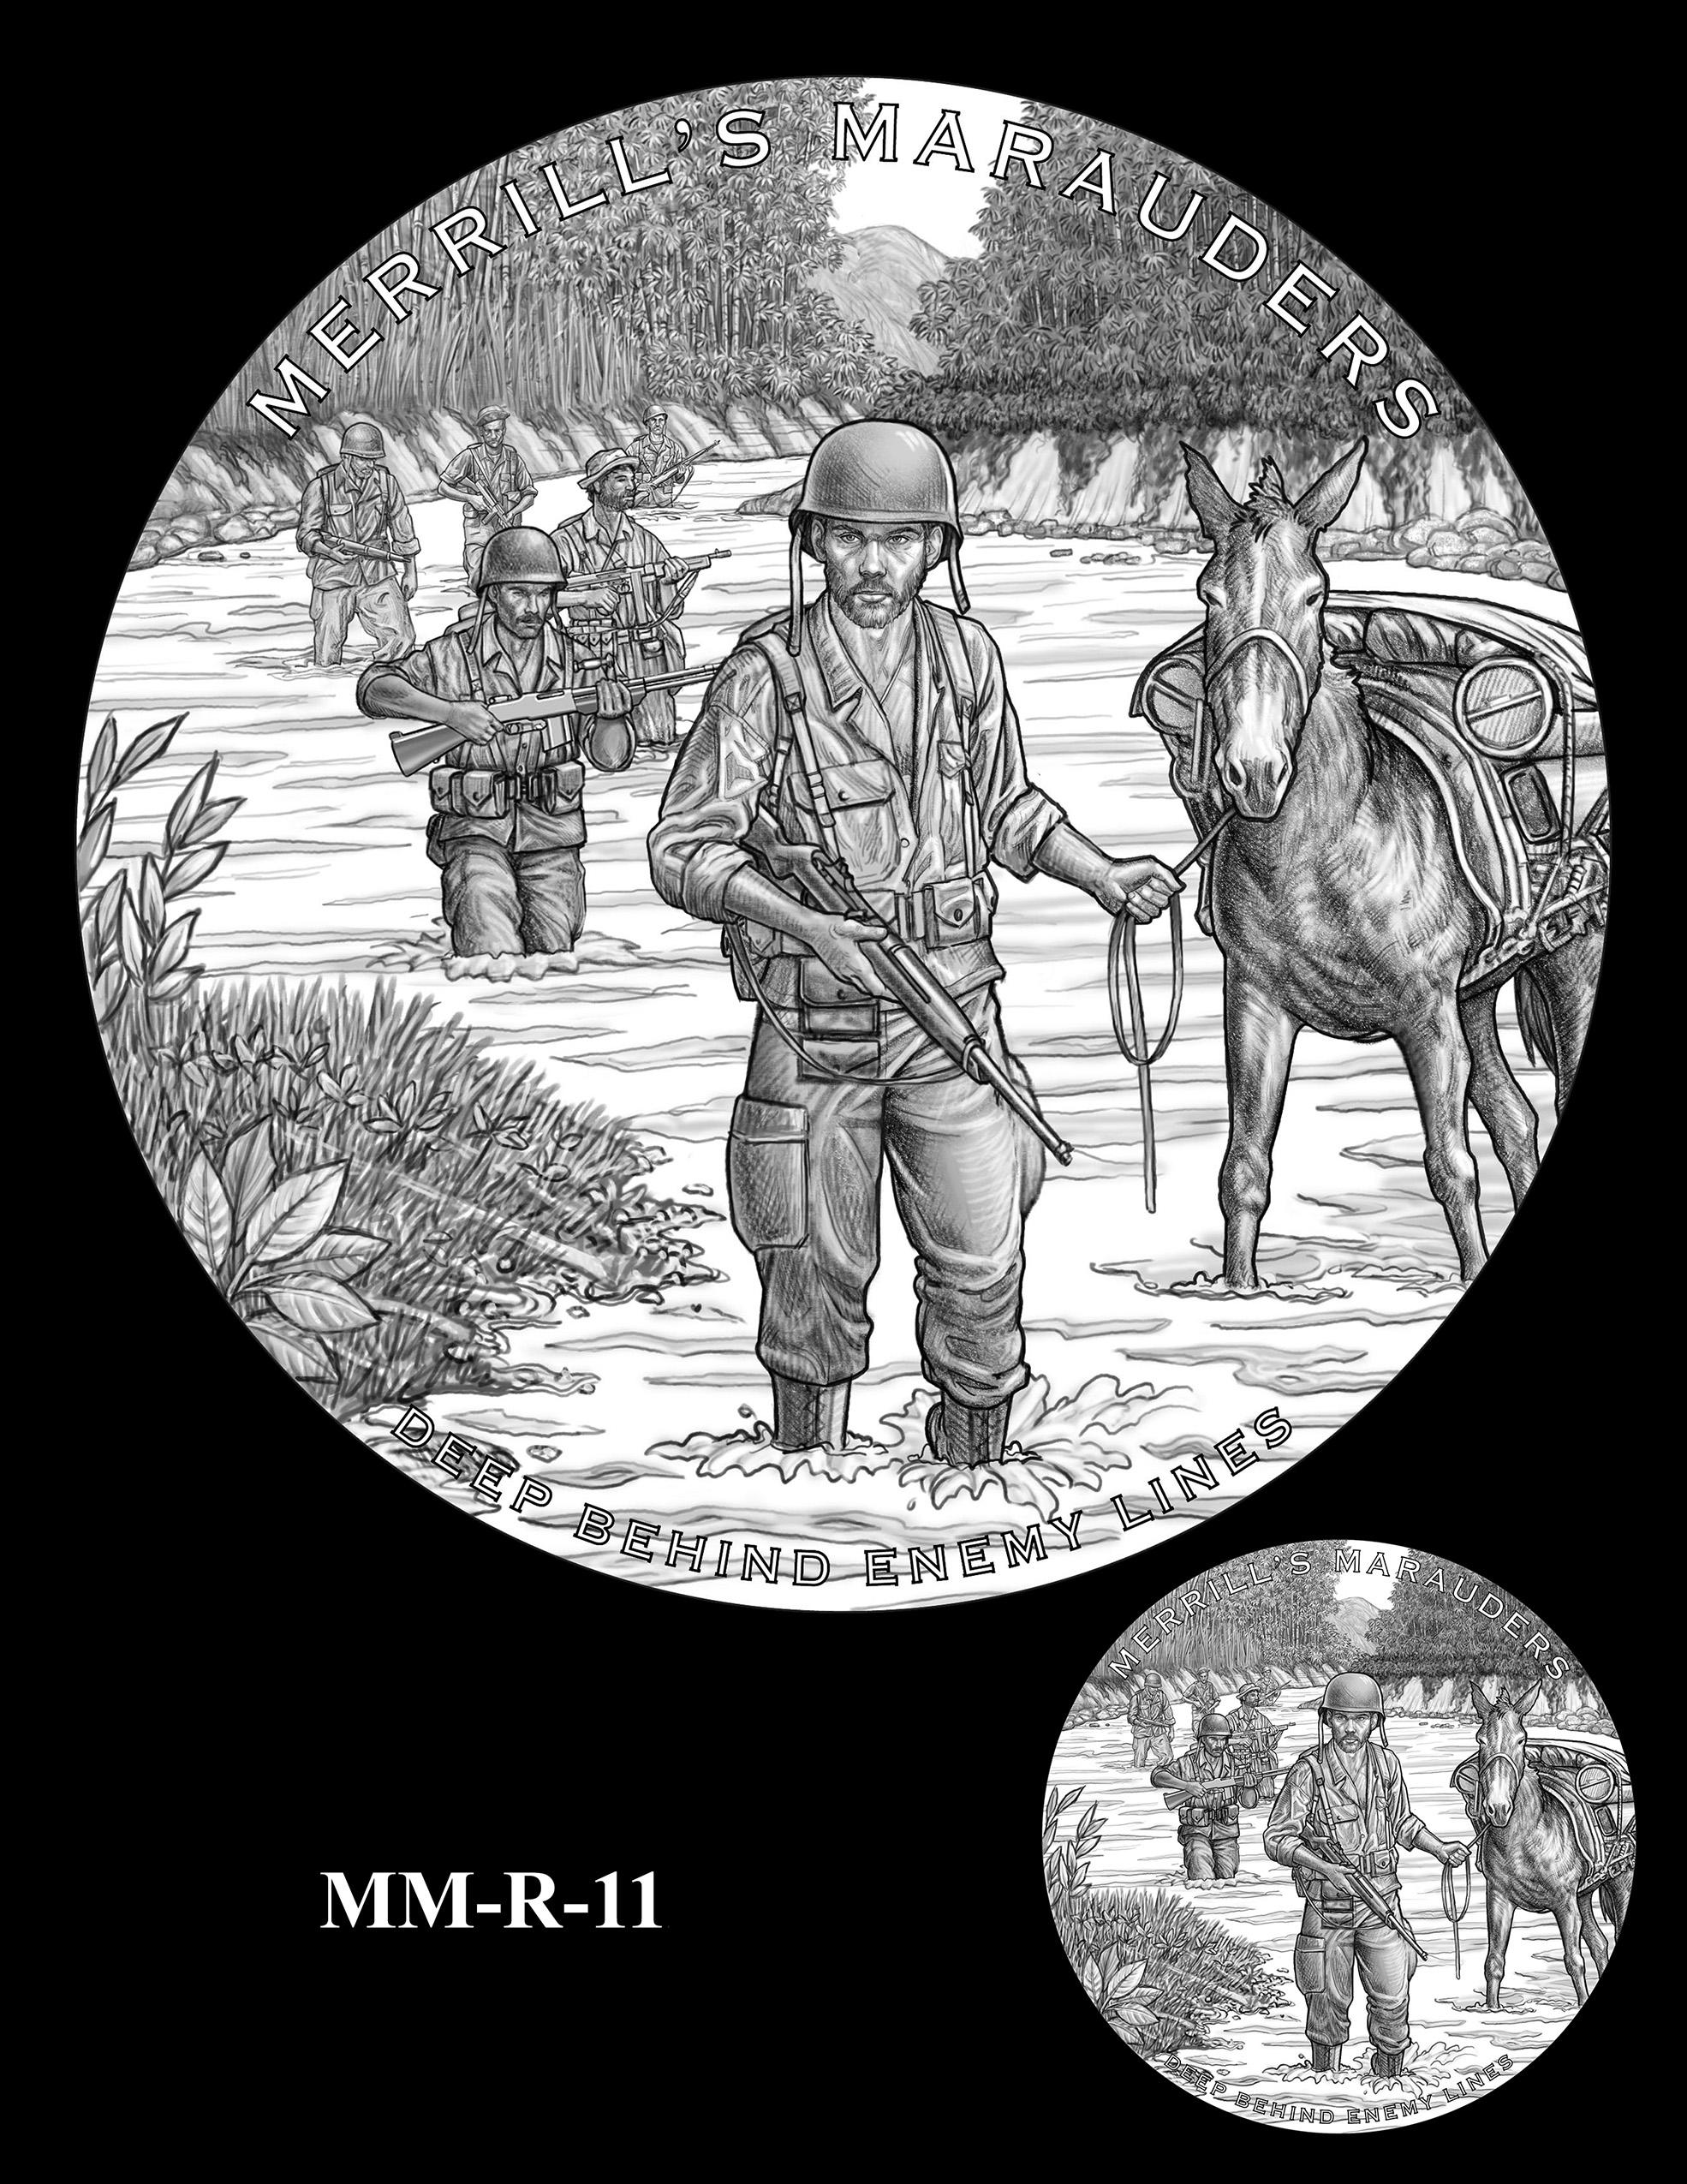 MM-R-11 -- Merrill's Marauders Congressional Gold Medal